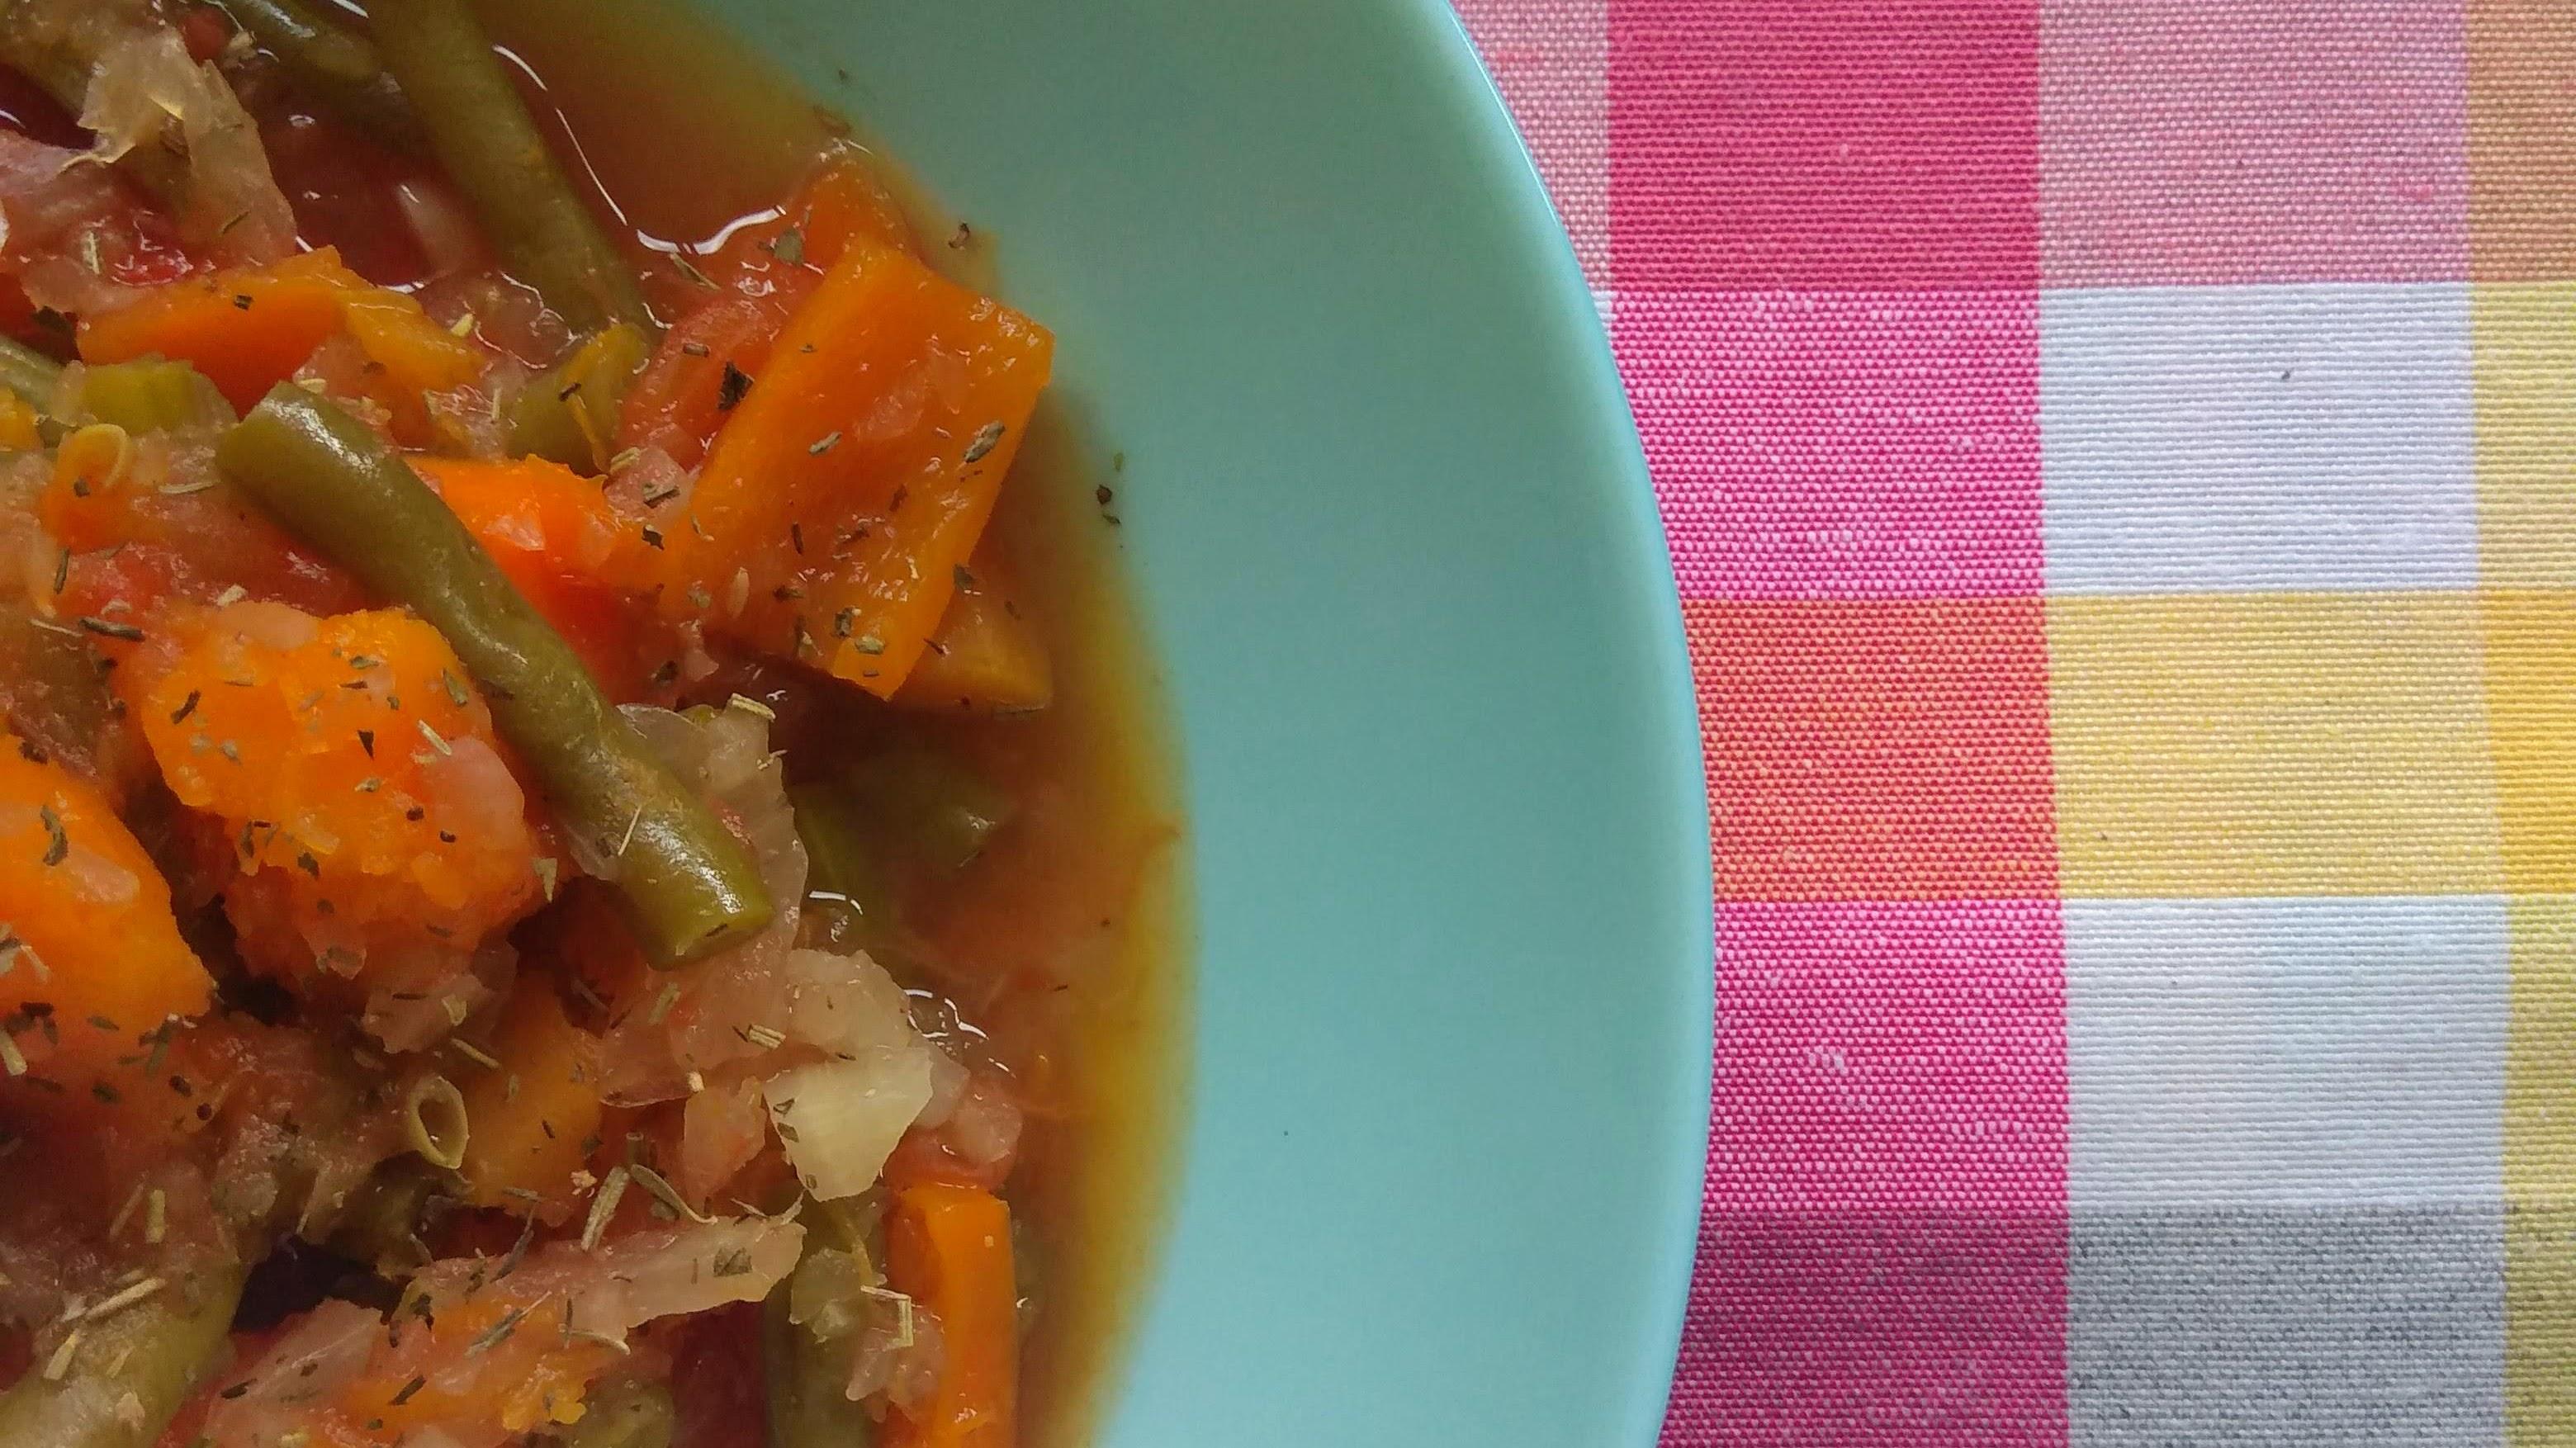 Receta: Verduras guisadas. Descúbrela en: www.cocinandoconlola.com